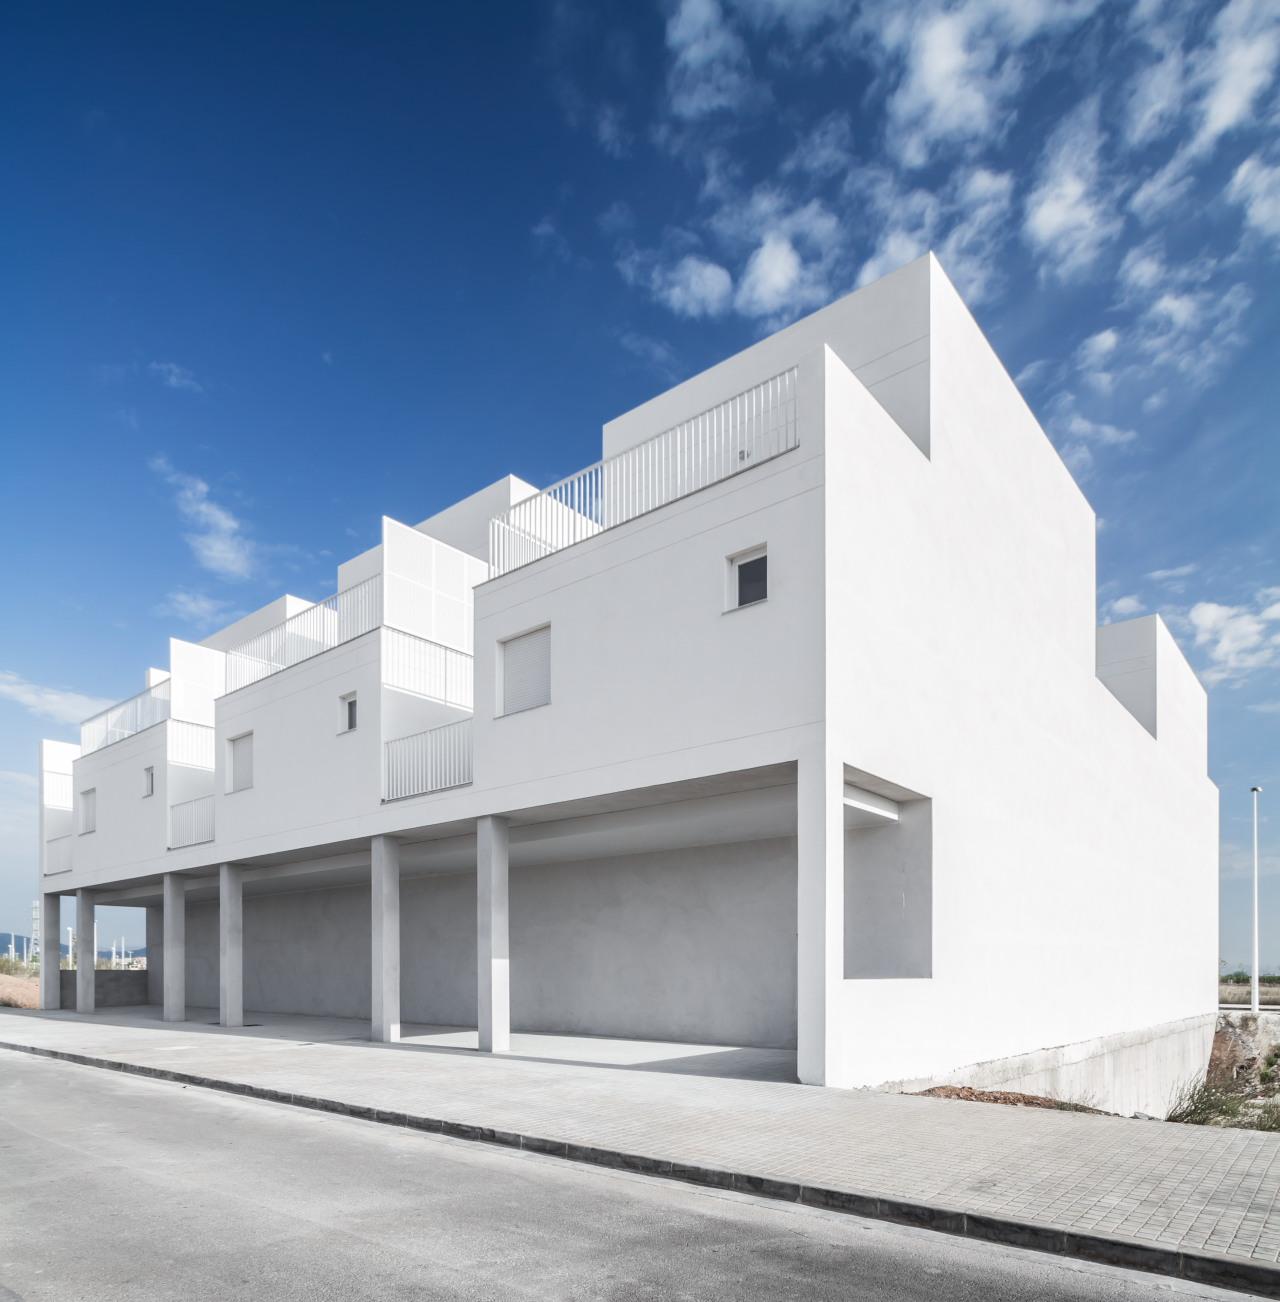 fotografia-arquitectura-valencia-german-cabo-viraje-sagunto (2)